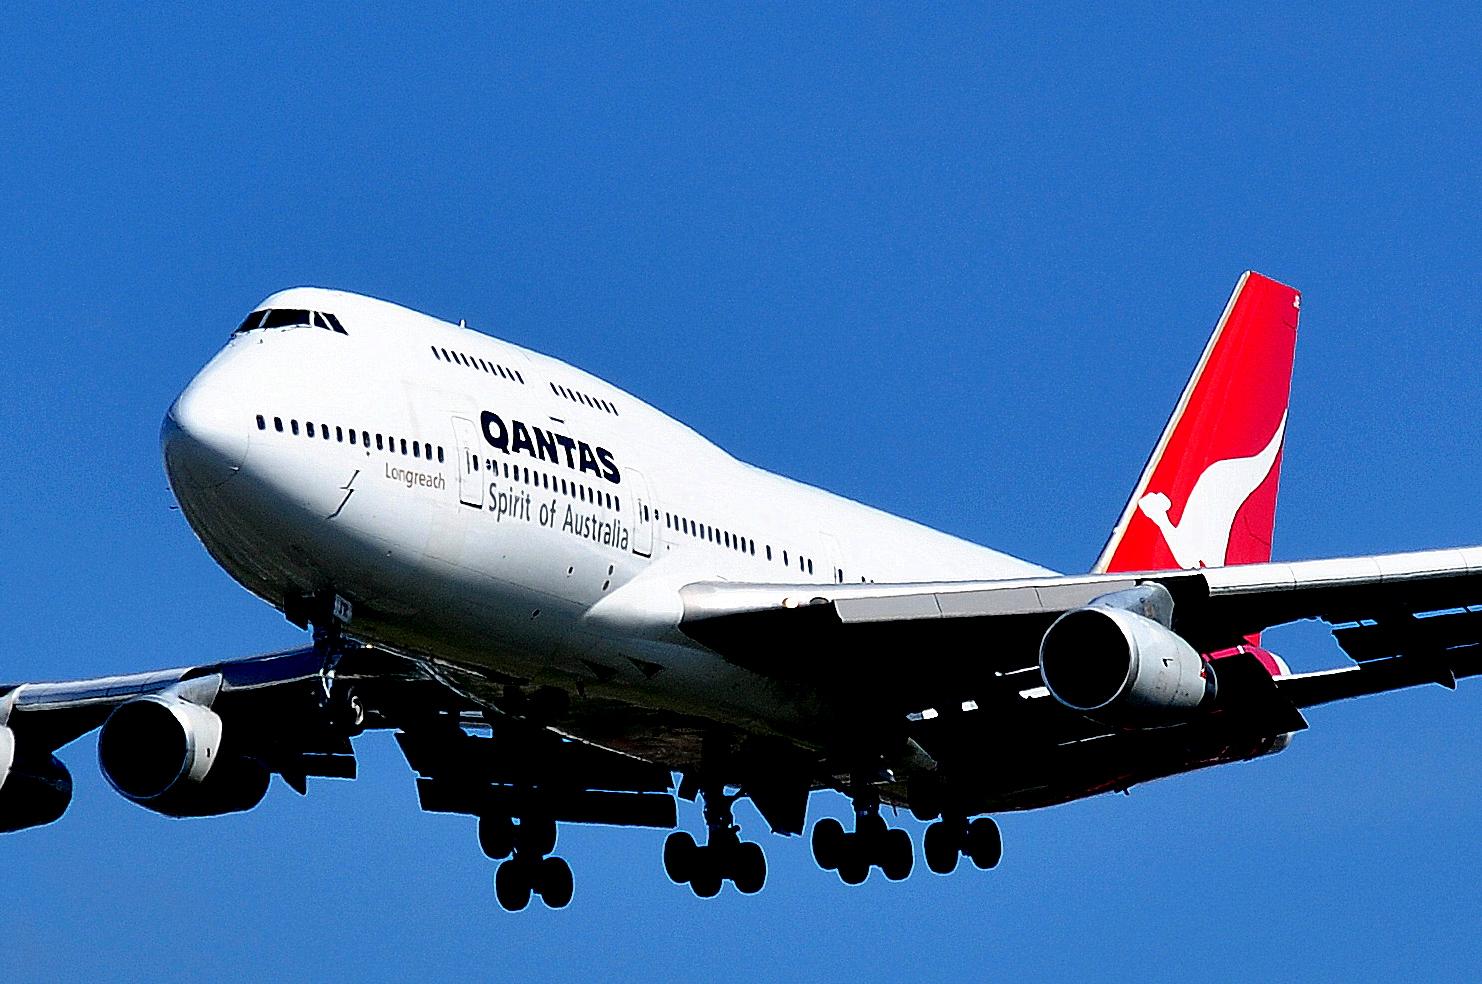 boeing_747-438_qantas_vh-ojr.JPG